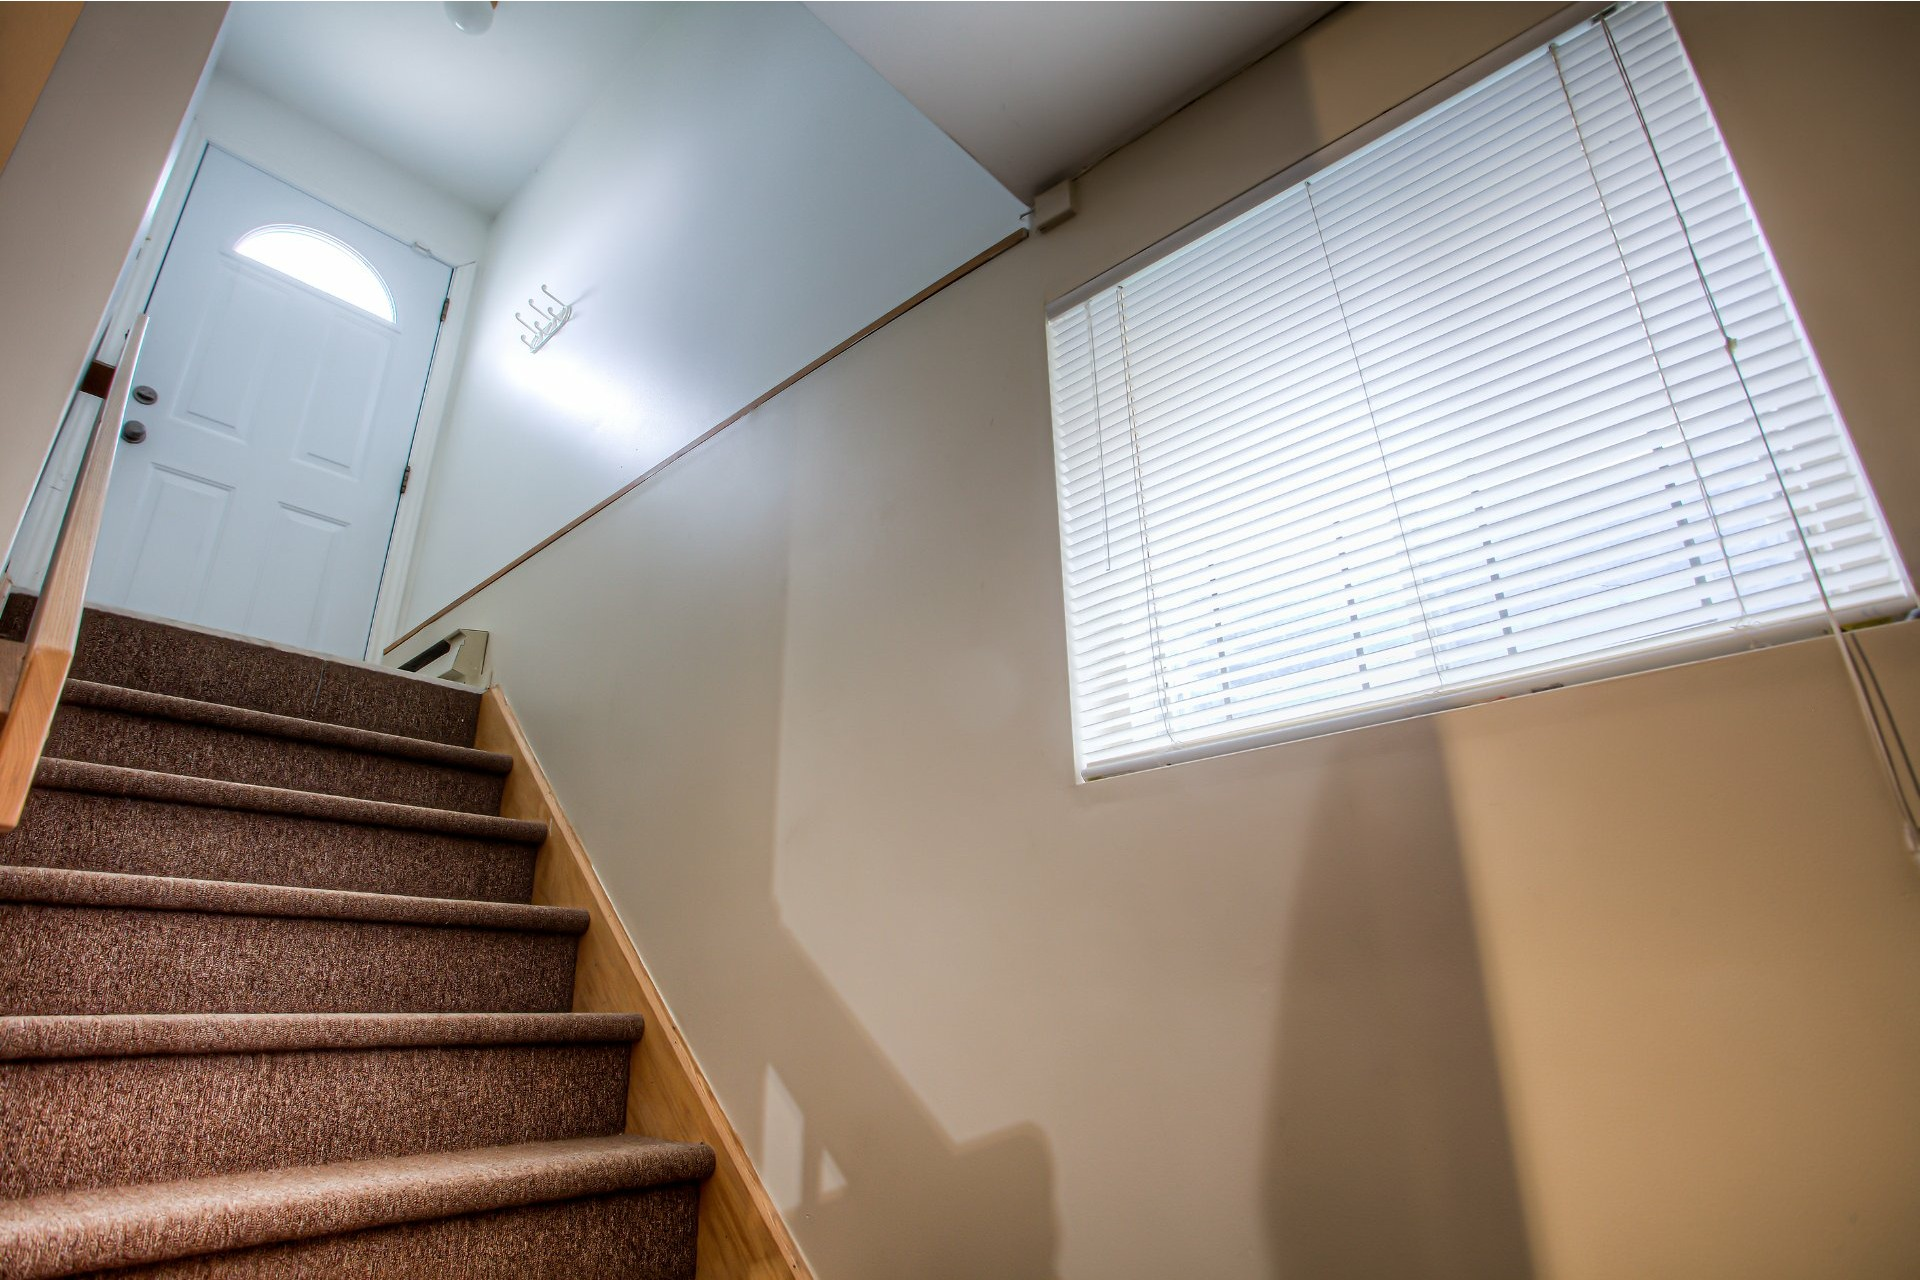 image 24 - MX - Casa sola - MX En venta Dollard-Des Ormeaux - 11 habitaciones